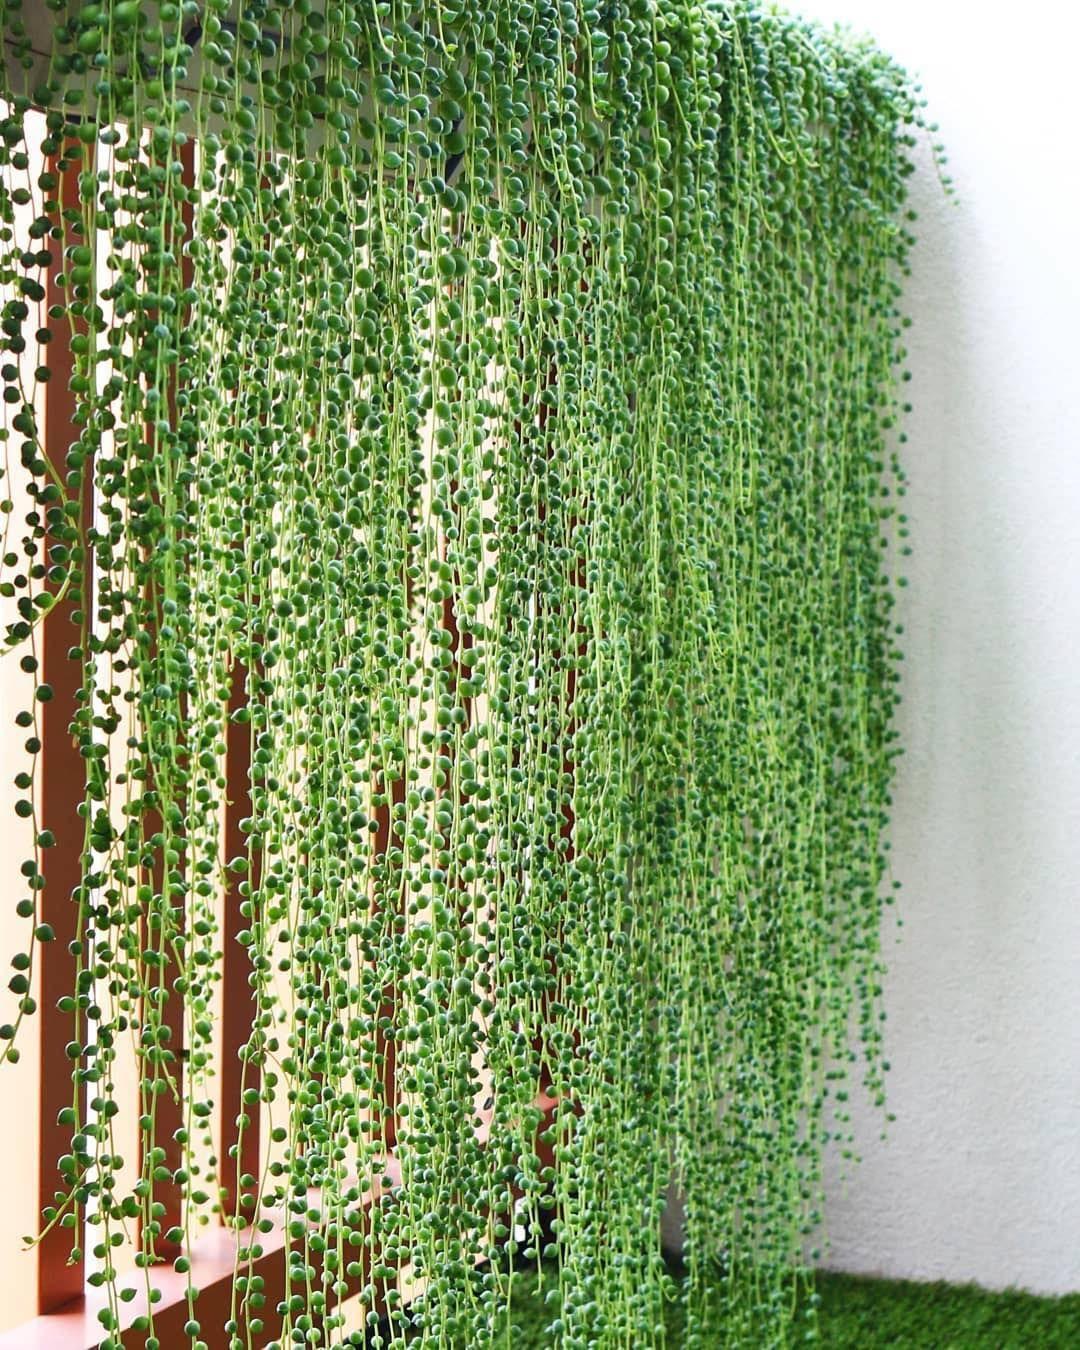 best privacy fence i ever seen   ud83d udc4c ud83c udffd ud83d udc4c ud83c udffd        repost  plant pets  u30fb u30fb u30fb wall of pearls as balcony